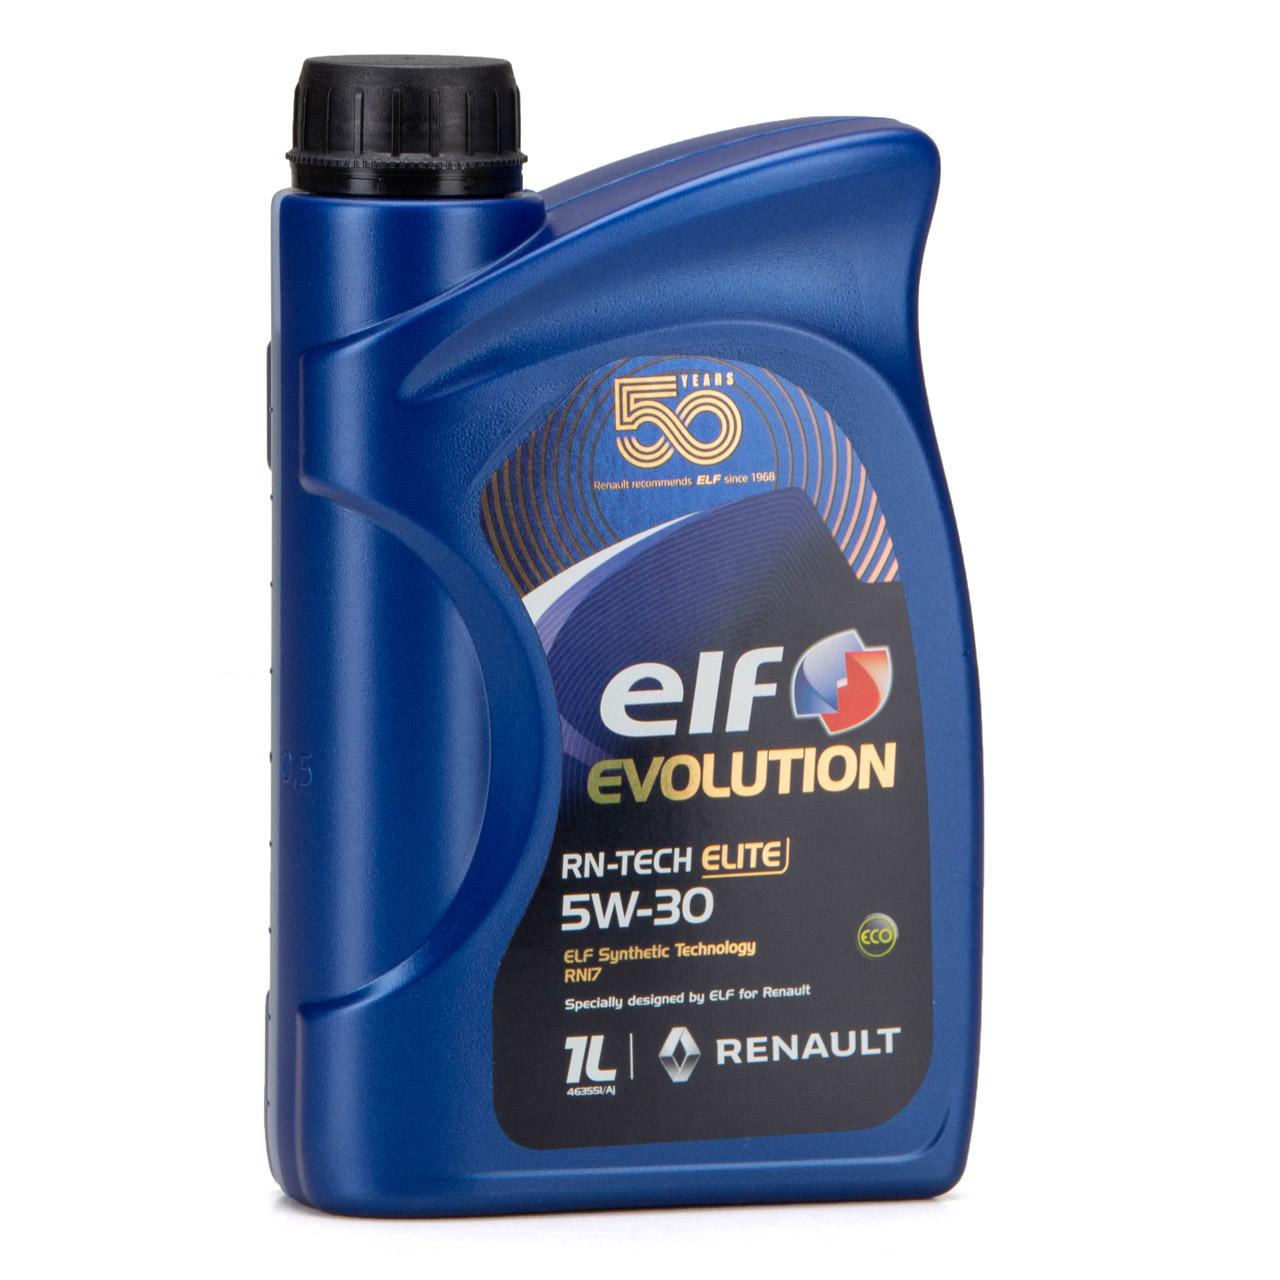 elf Evolution RN-TECH ELITE 5W-30 5W30 Motoröl Öl C3 Renault RN17 - 2L 2 Liter